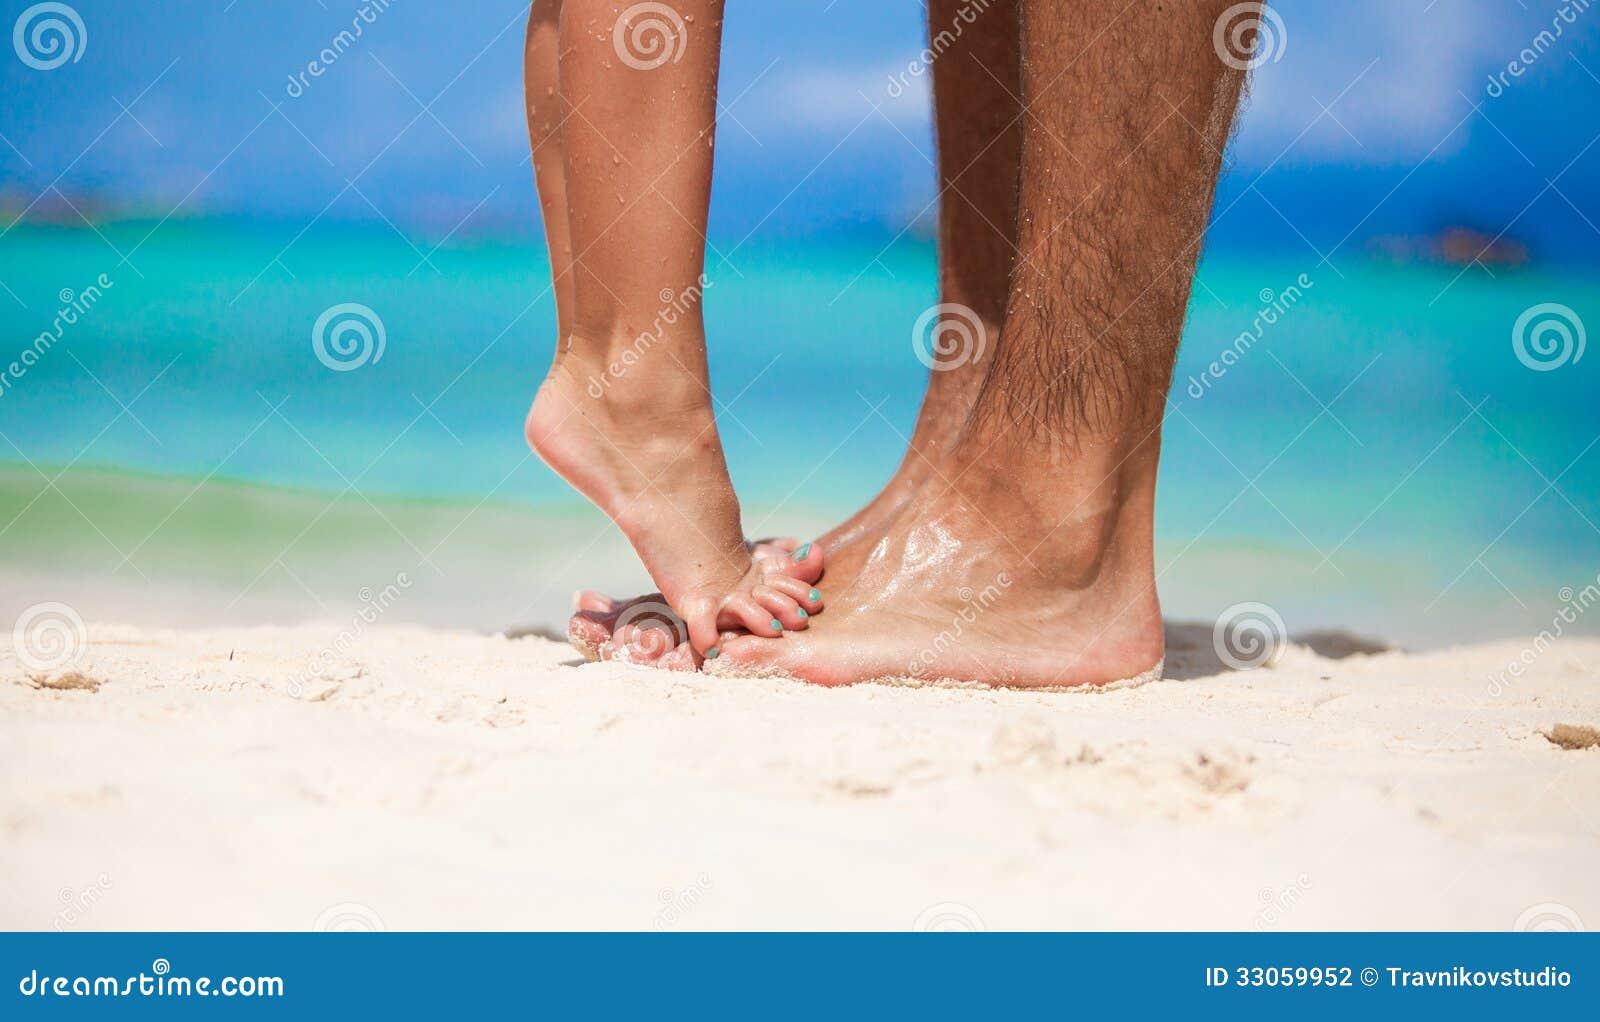 Sandi beach porn